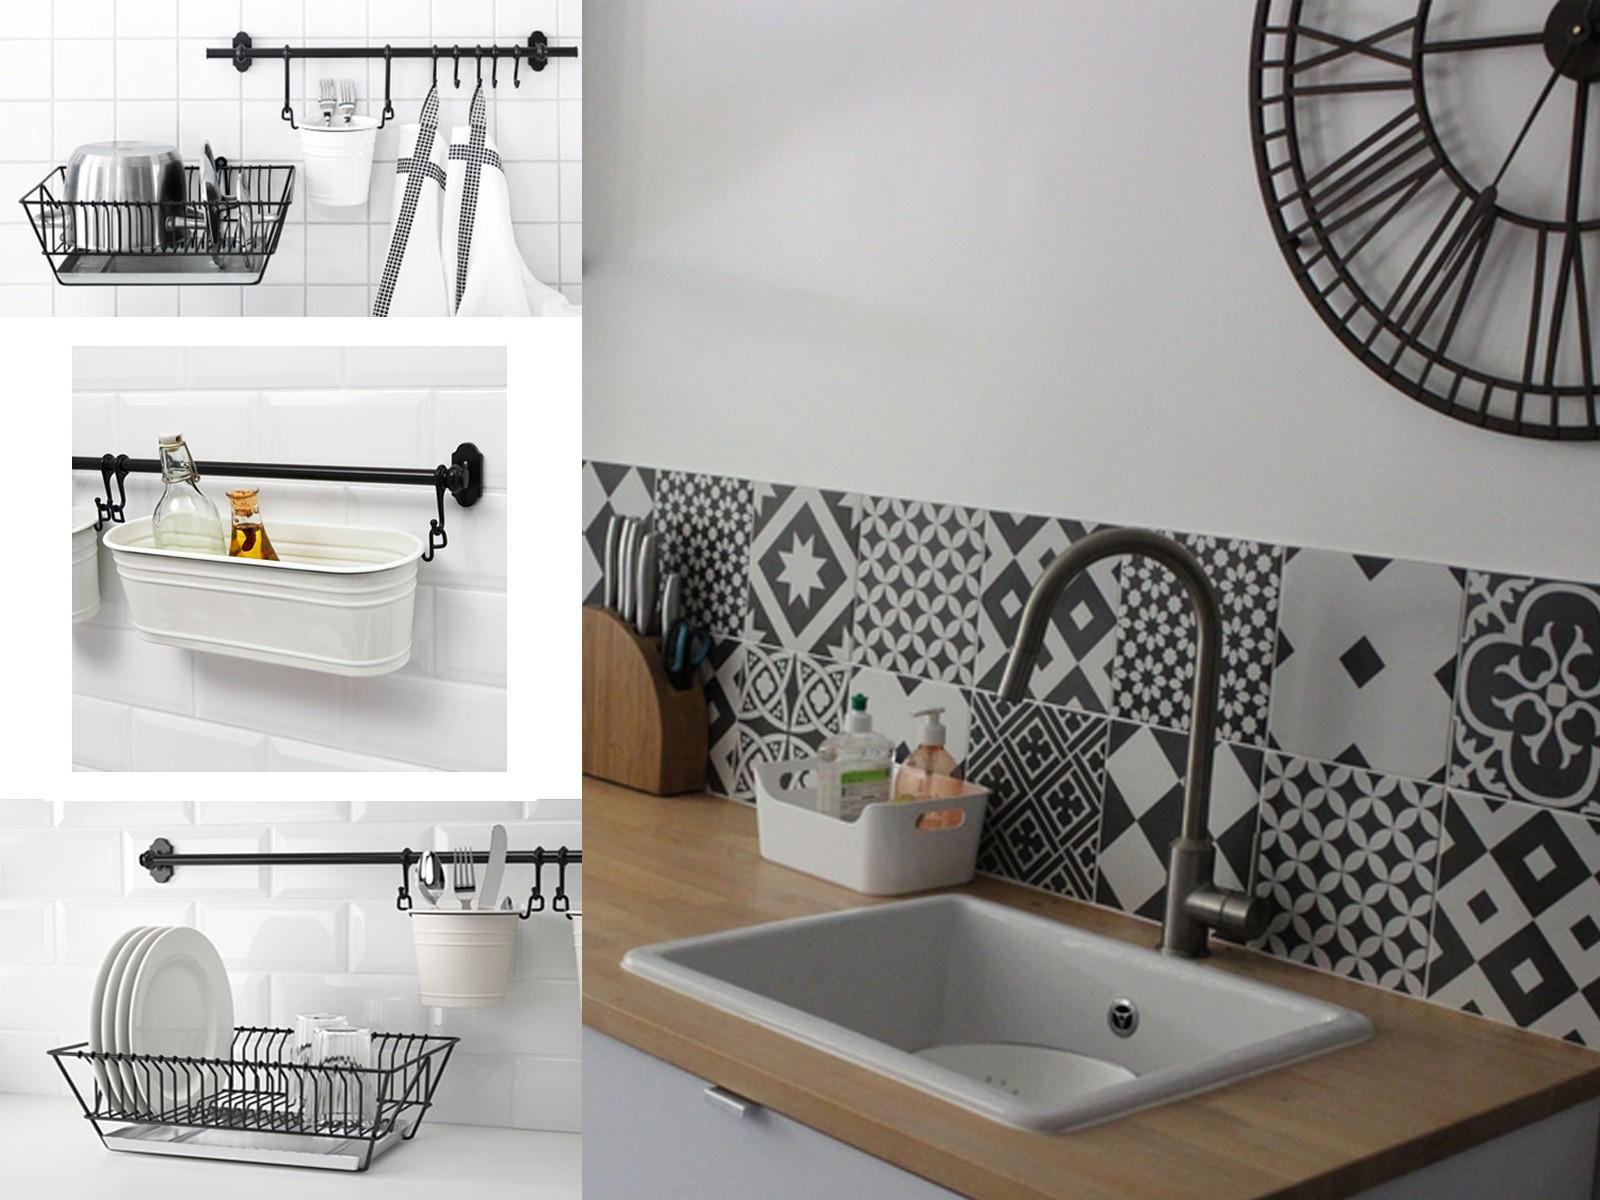 ikea evier a poser domsjo id es de travaux. Black Bedroom Furniture Sets. Home Design Ideas